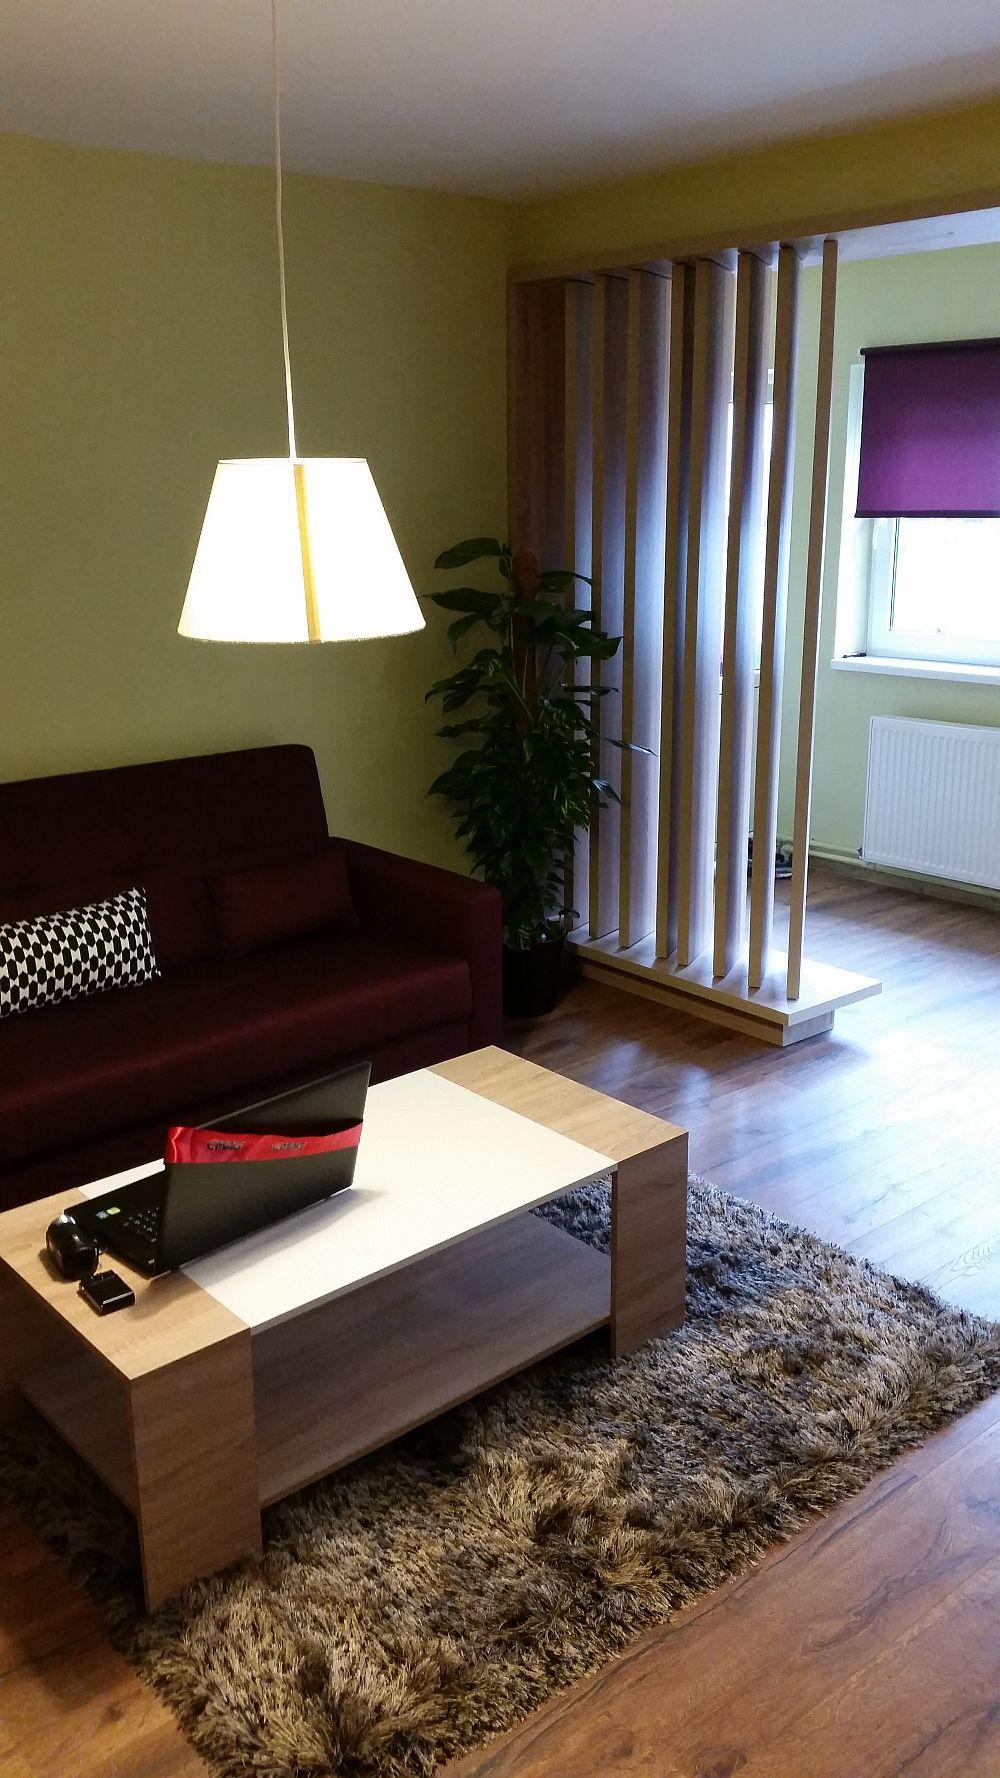 adelaparvu.com despre casa familie Mihai din Jilava, casa lui Mery, emisiunea Visuri la cheie, sezon I, ProTV (30)